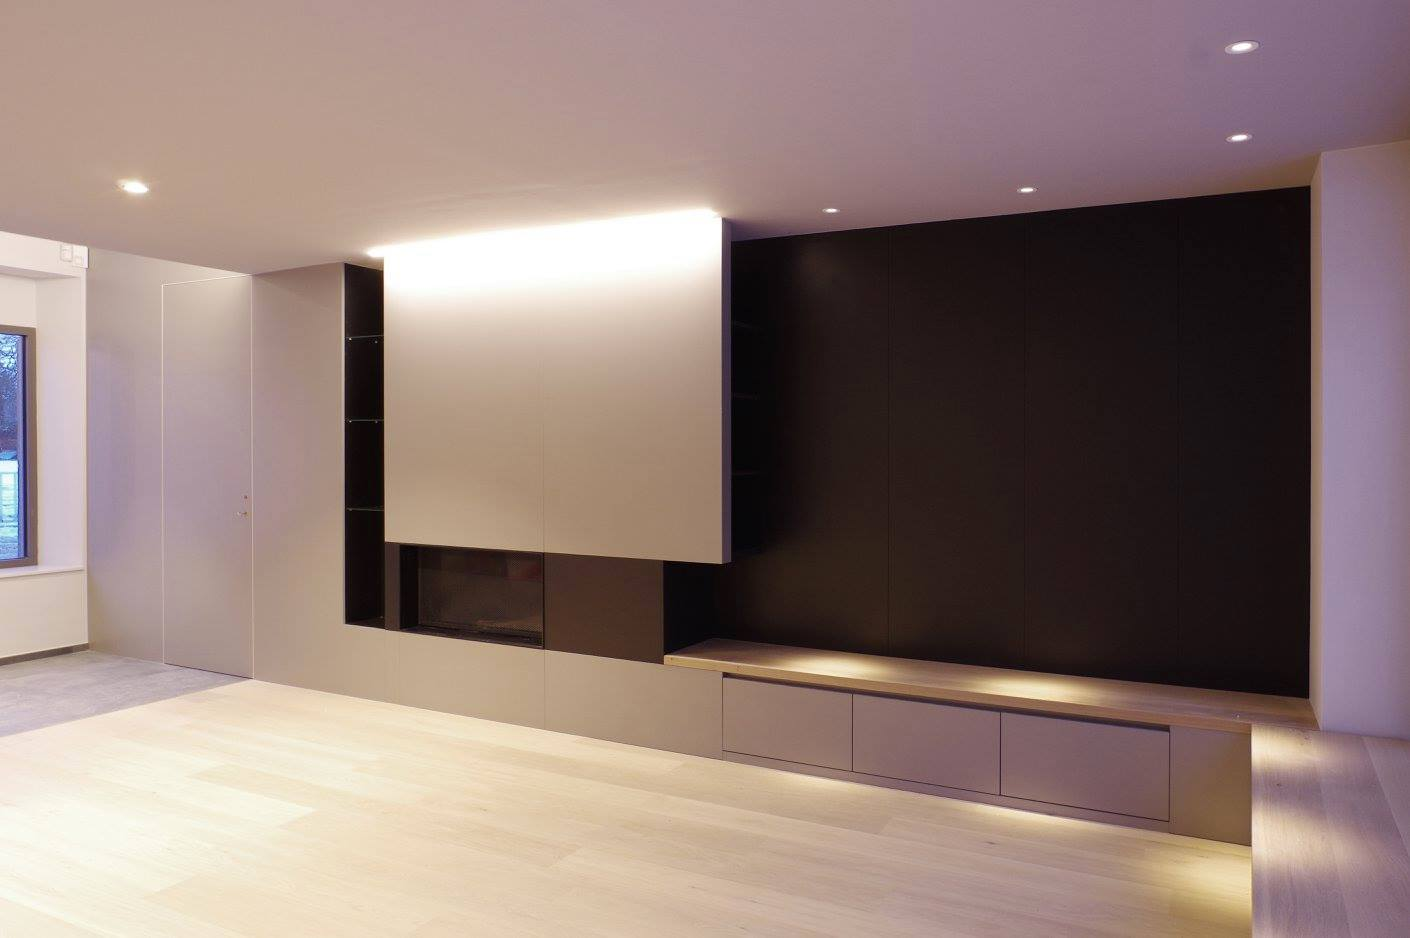 conception r alisation de meubles tv foyer. Black Bedroom Furniture Sets. Home Design Ideas